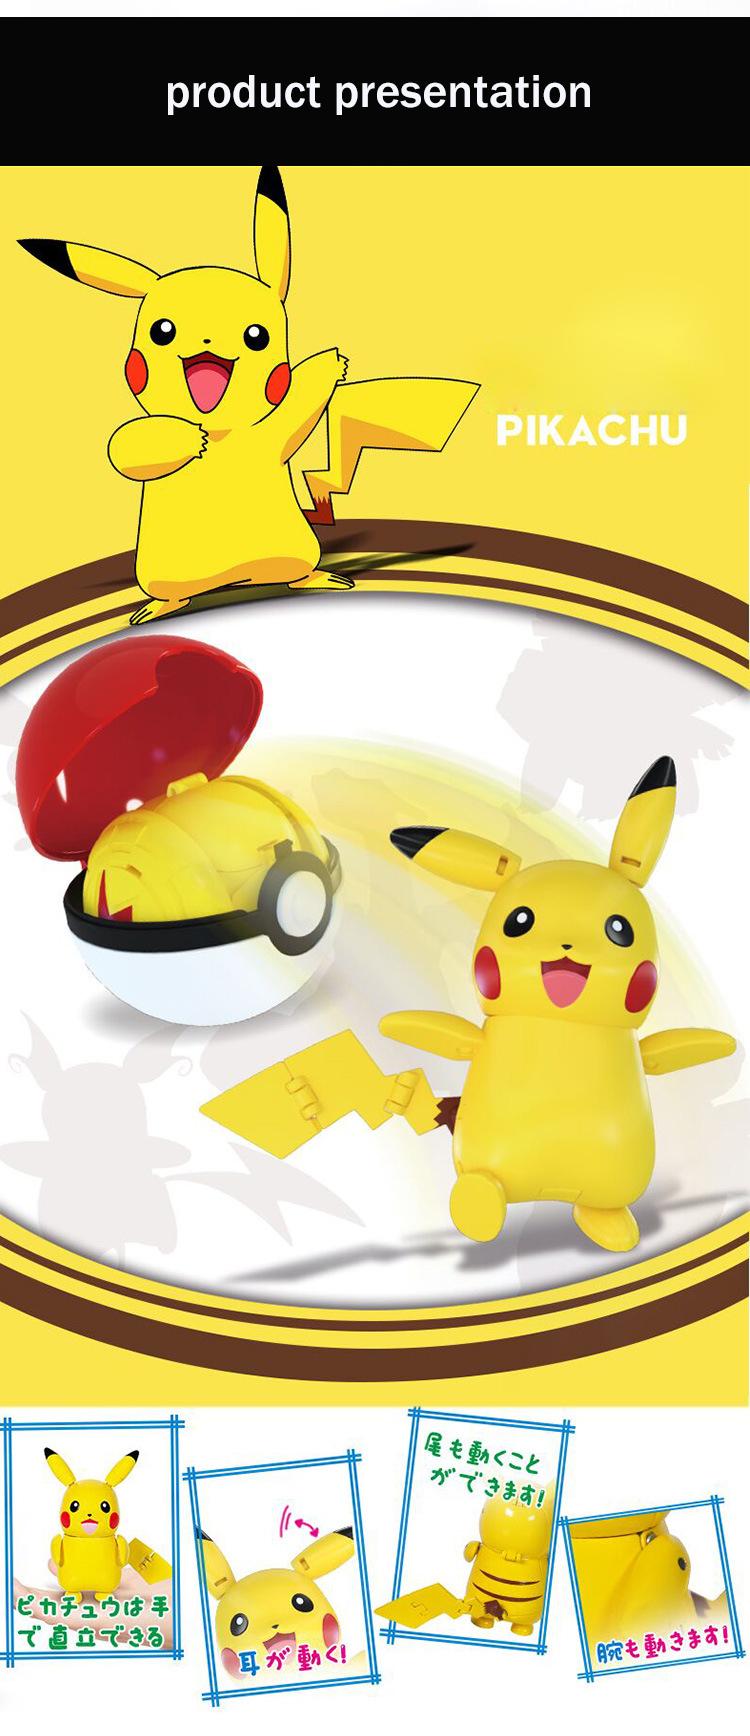 Seltsame dinge Japan anime nintendo pokemon action-figuren von Chna